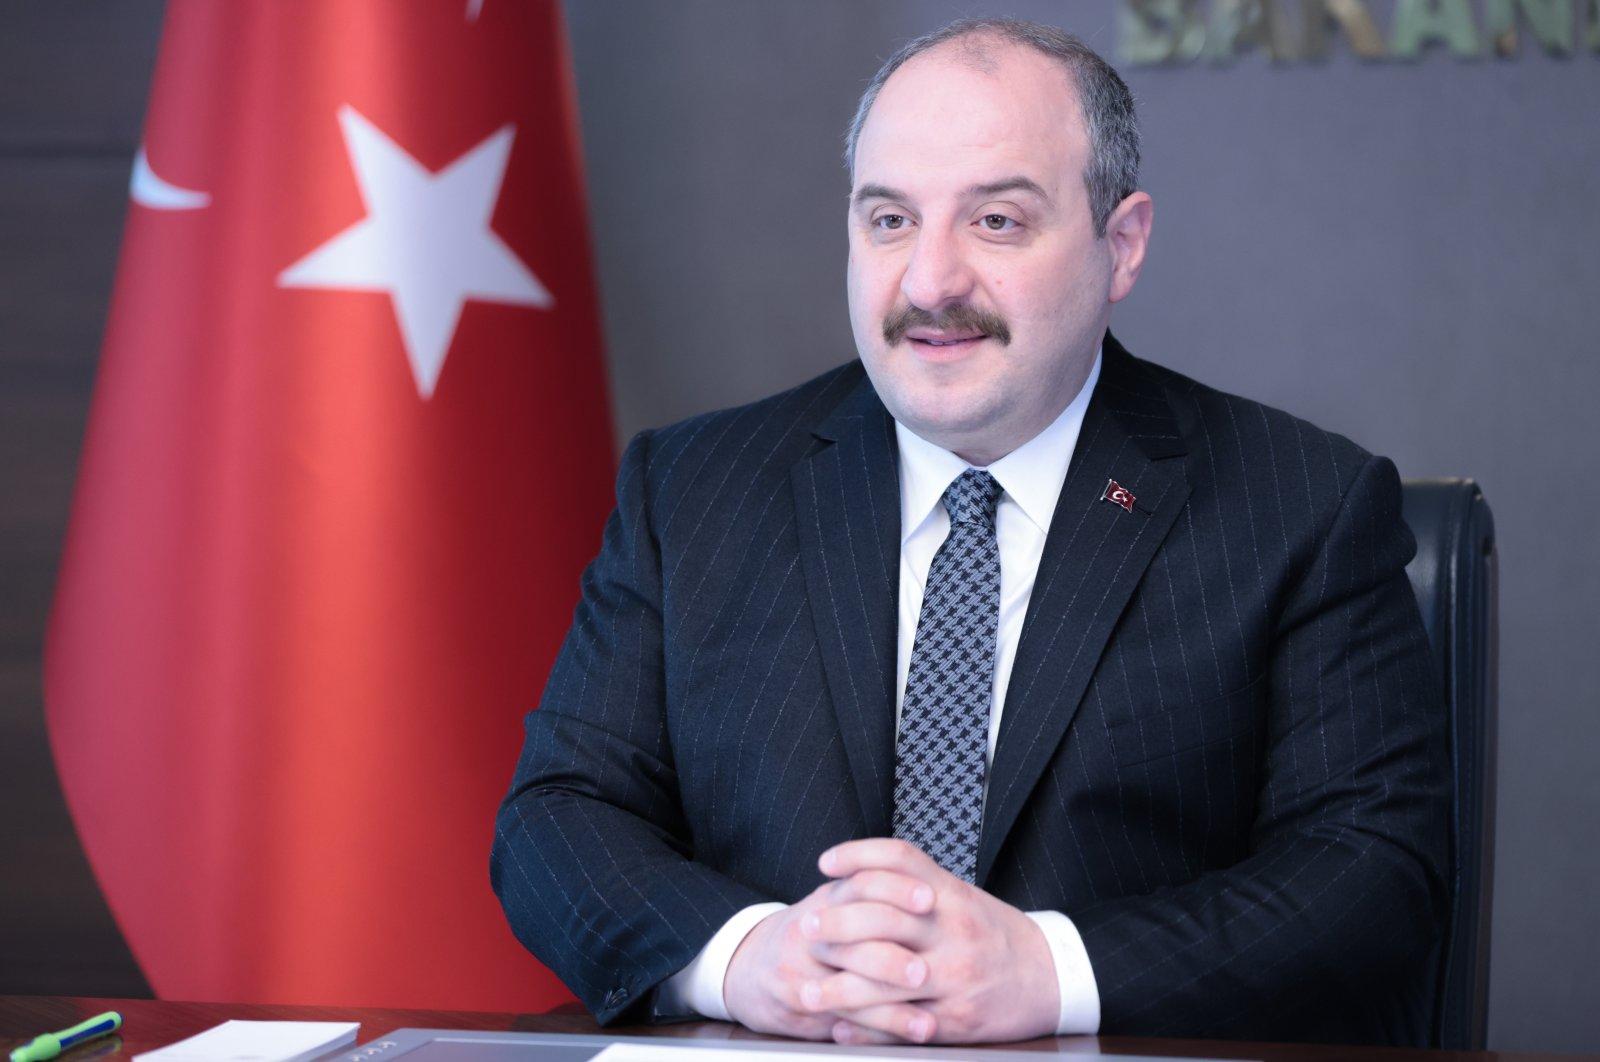 Industry and Technology Minister Mustafa Varank attends the Global Technology Governance Summit organized by the World Economic Forum via videoconference, Ankara, Turkey, April 6, 2021. (AA Photo)